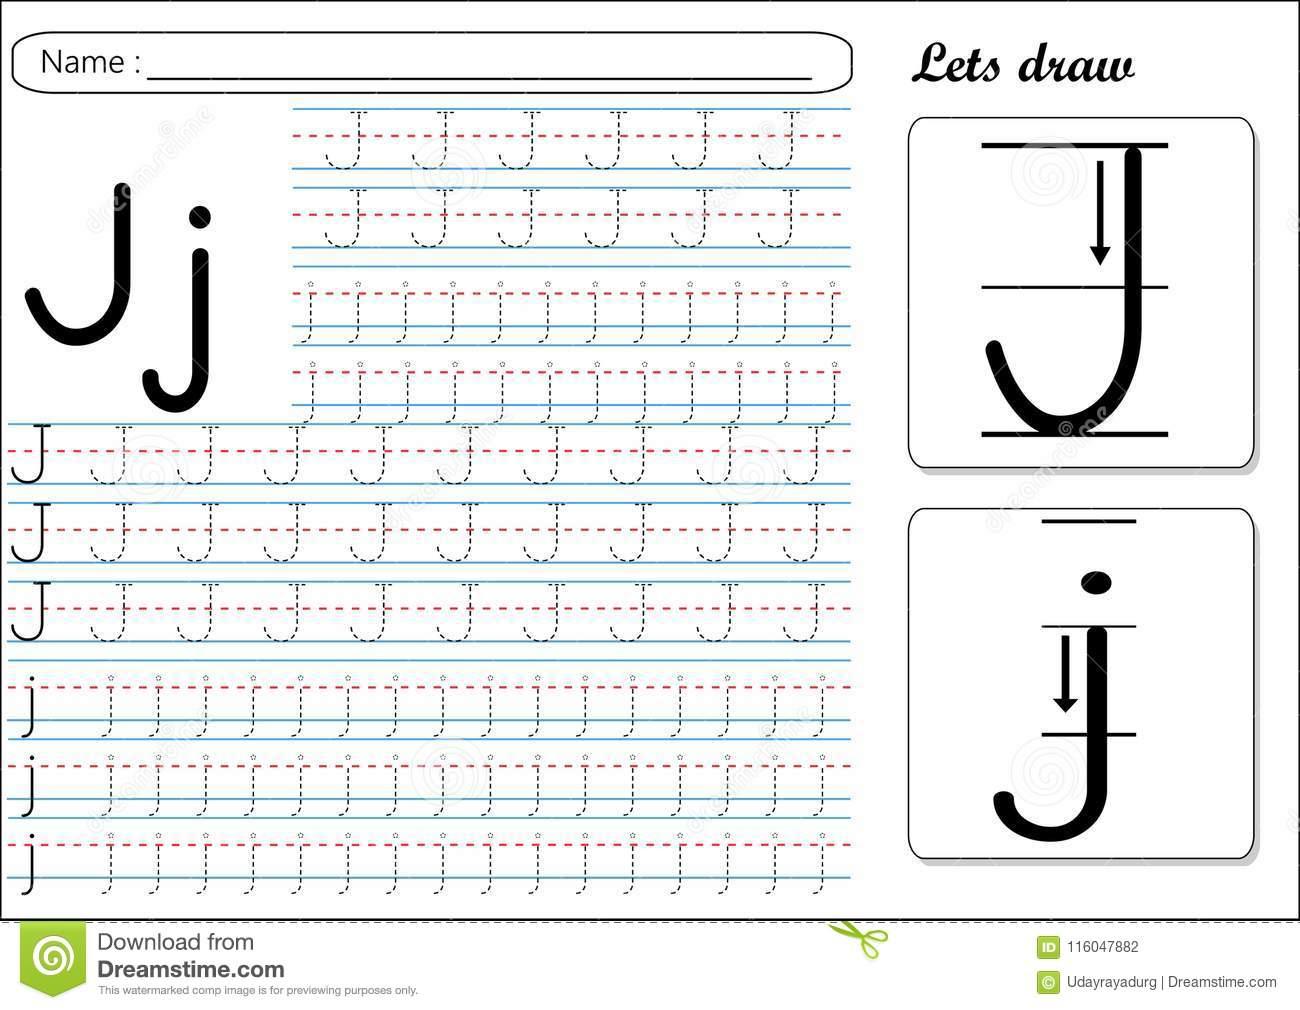 Tracing Worksheet -Jj Stock Vector. Illustration Of Spelling regarding Letter J Tracing Printables